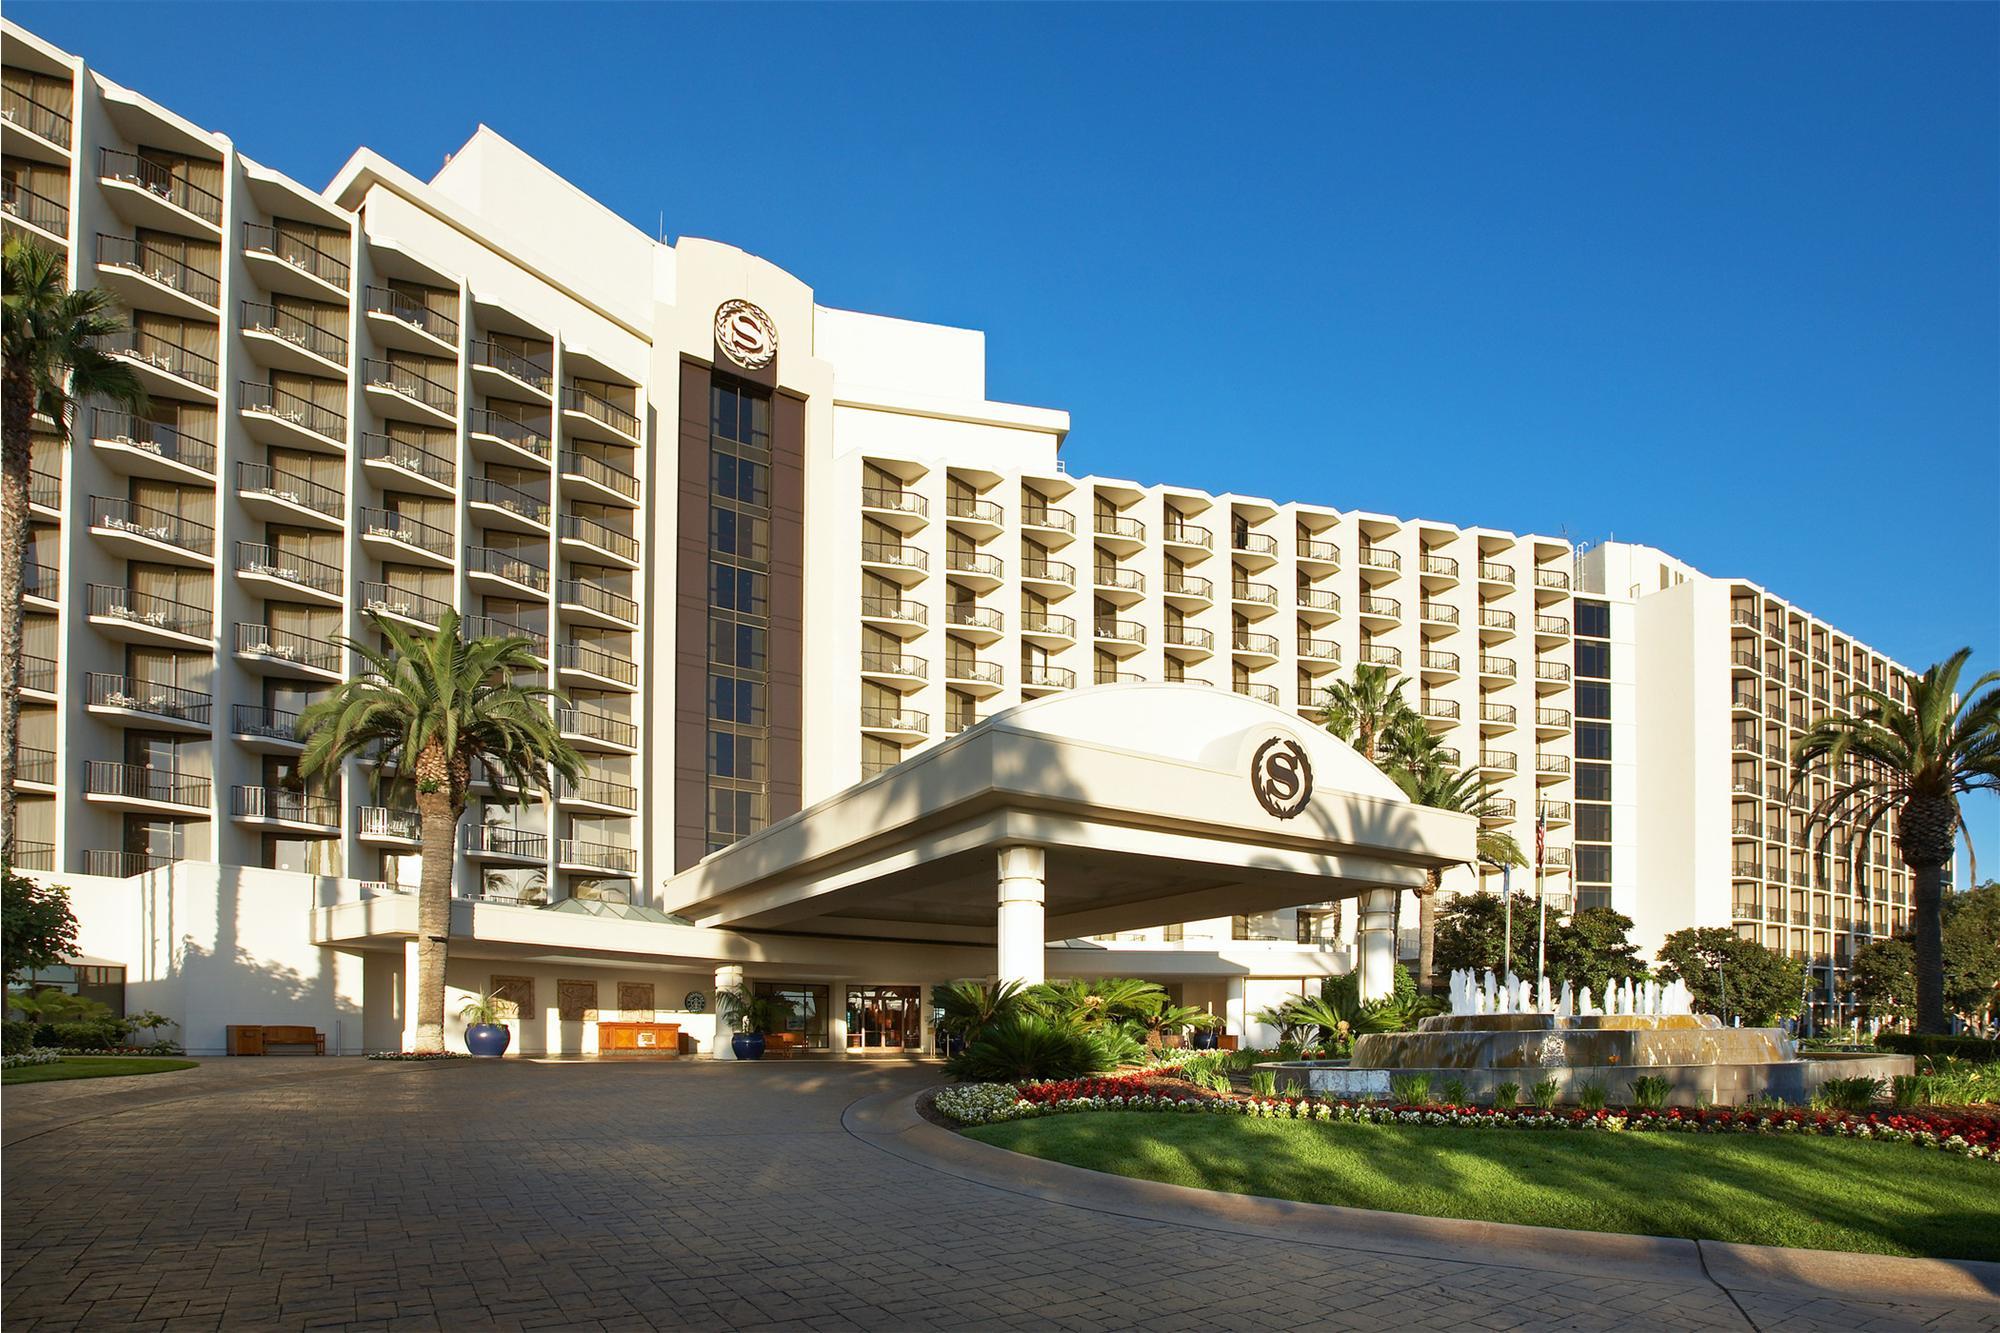 Sheraton san diego hotel marina in san diego ca 619 for Hotels 92109